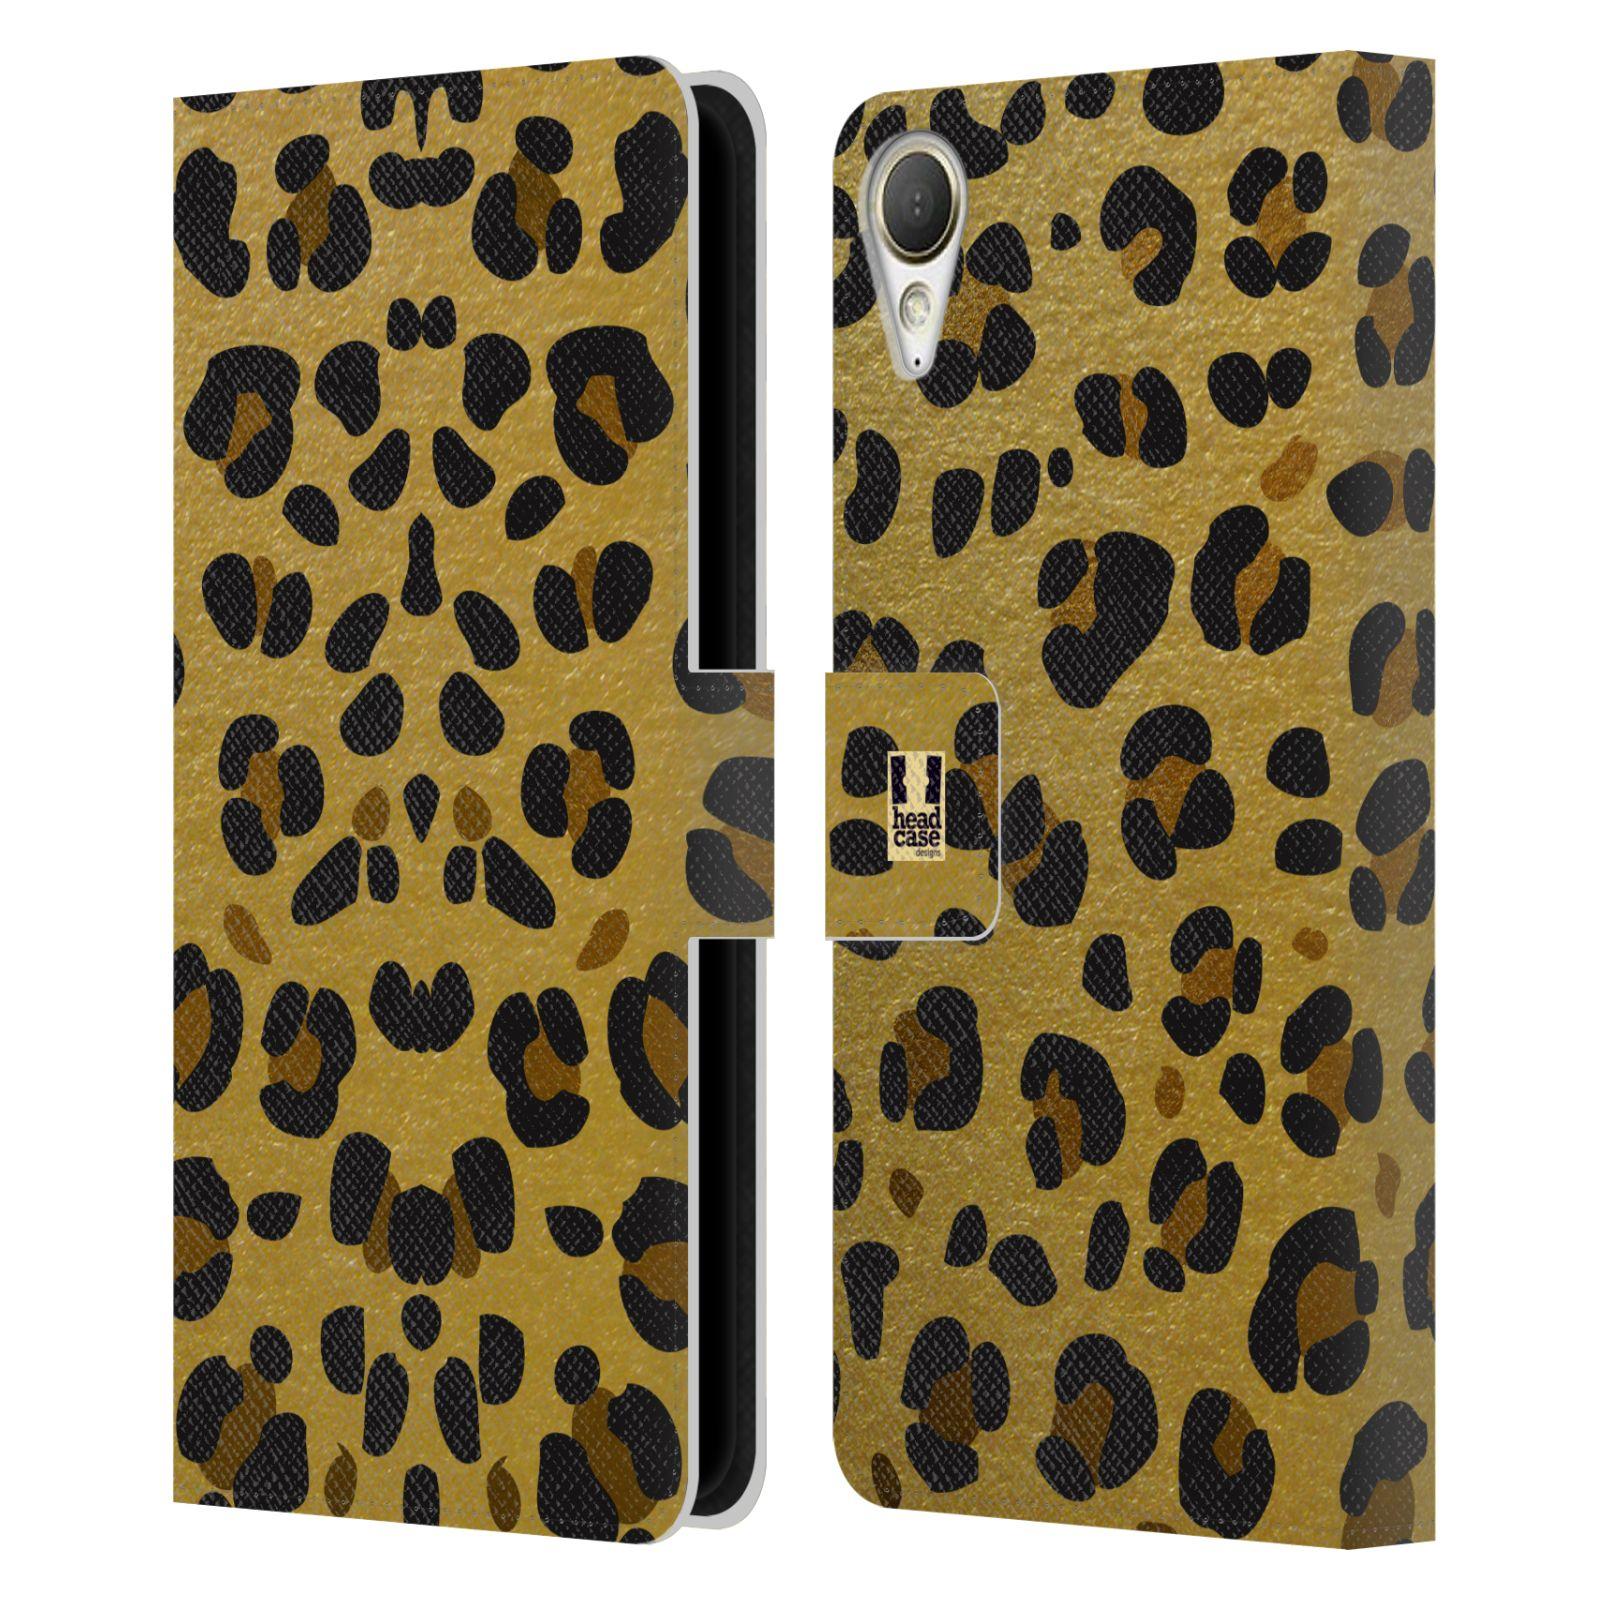 Pouzdro na mobil HTC Desire 10 Lifestyle - Head Case - Fashion zvířecí vzor